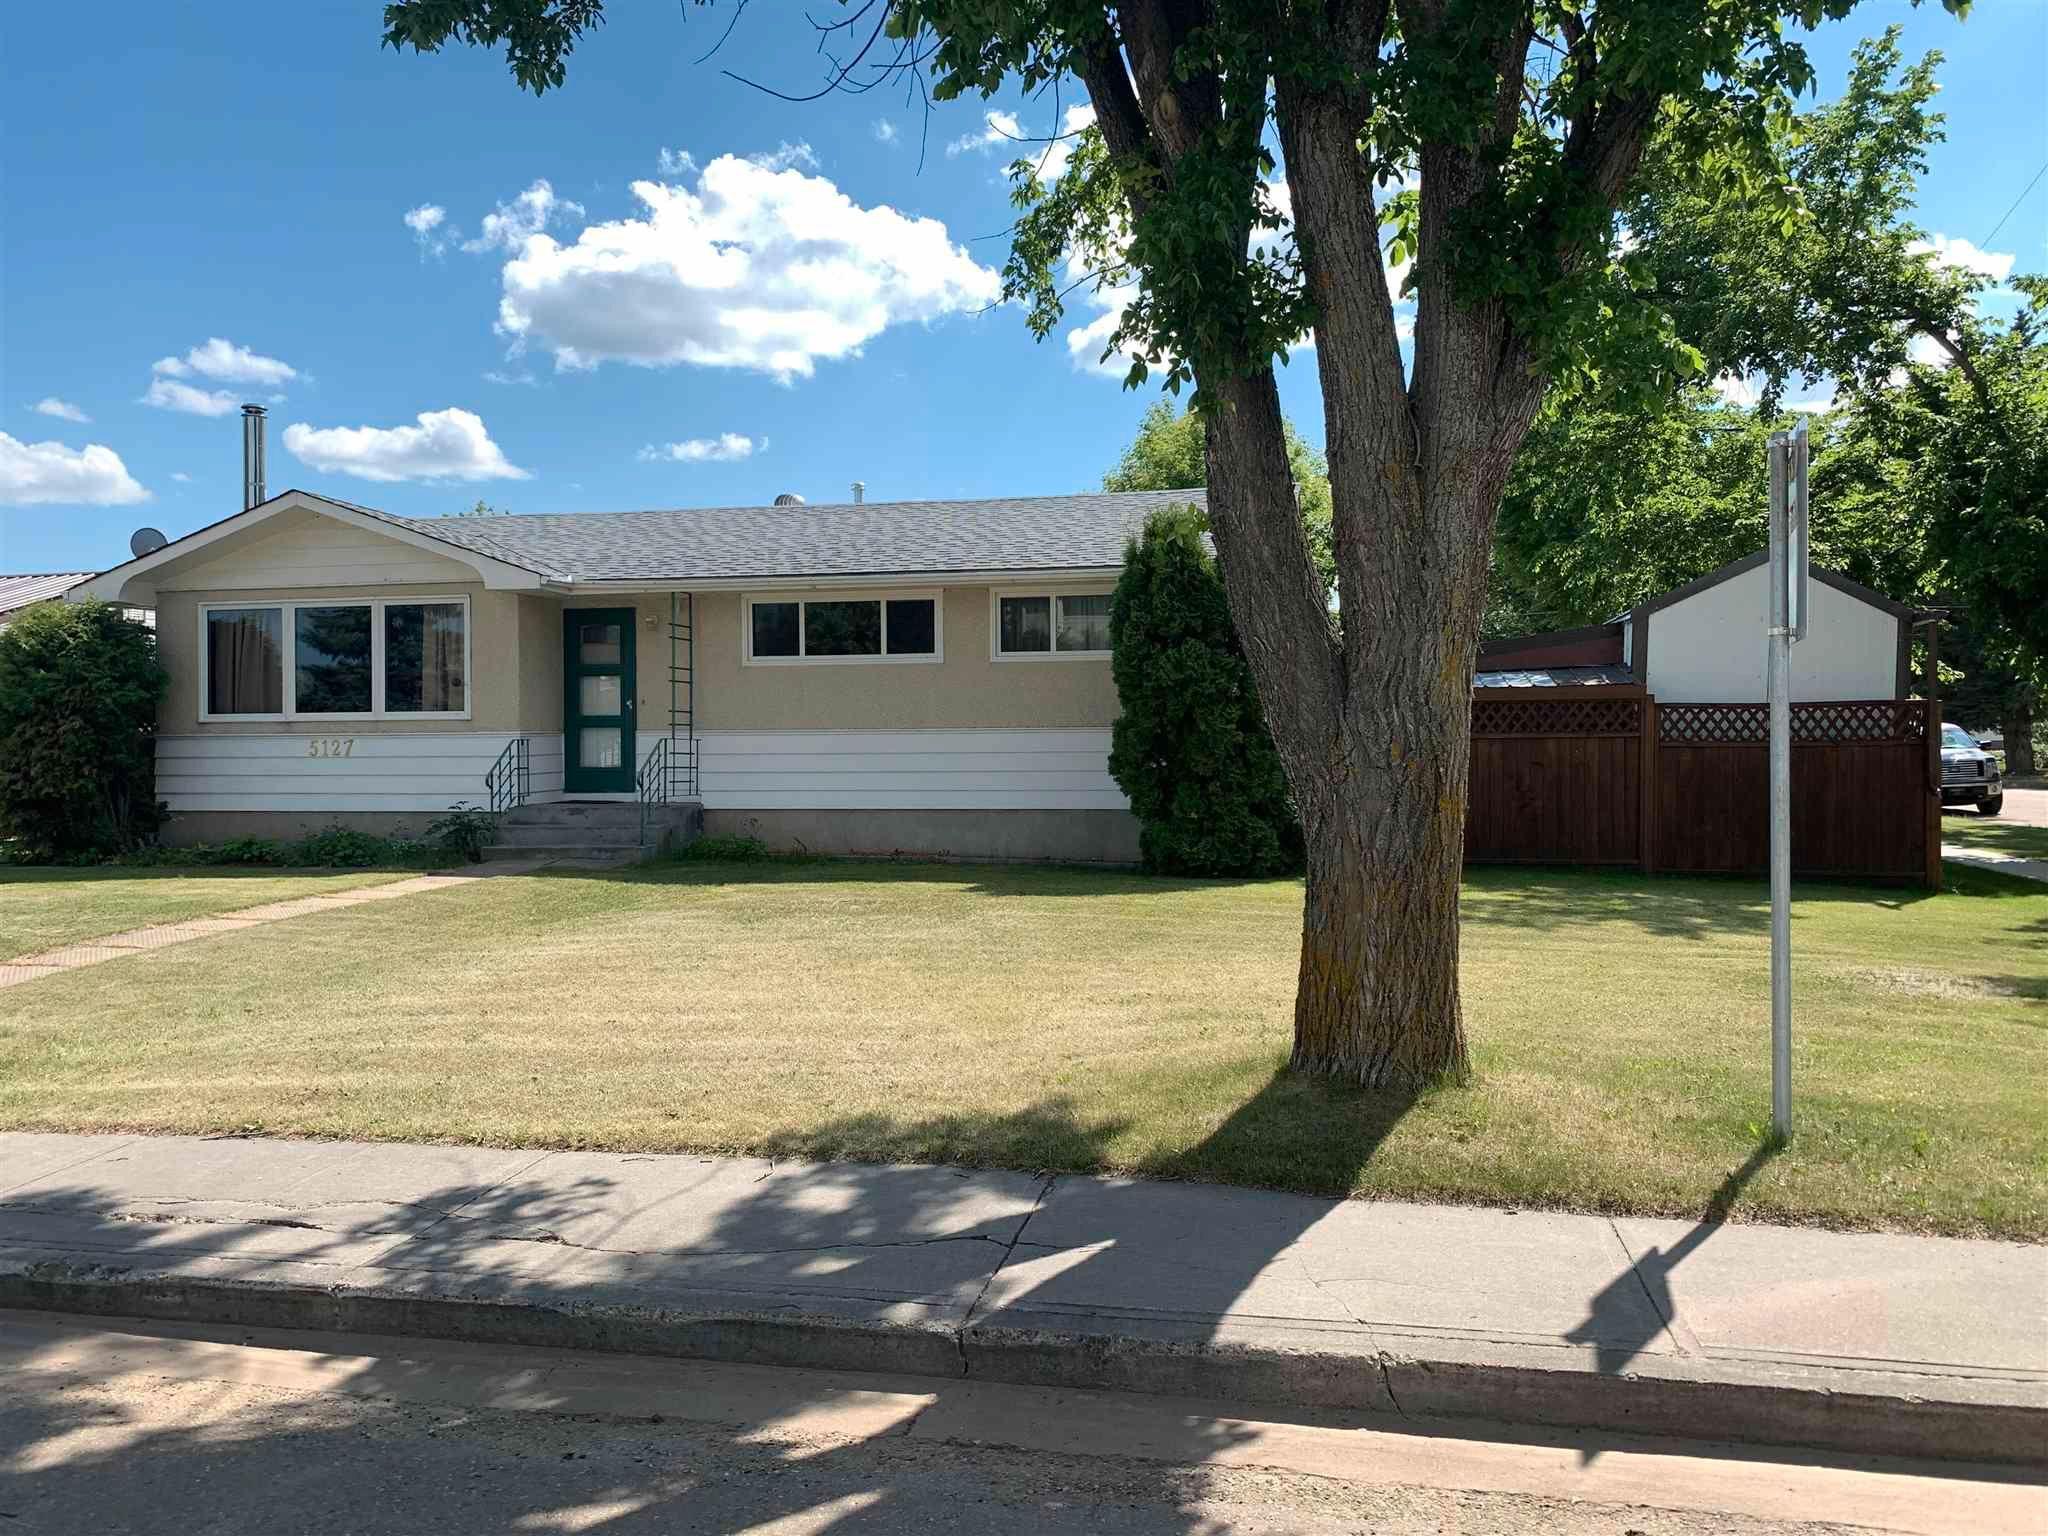 Main Photo: 5127 57 Avenue: Viking House for sale : MLS®# E4251447